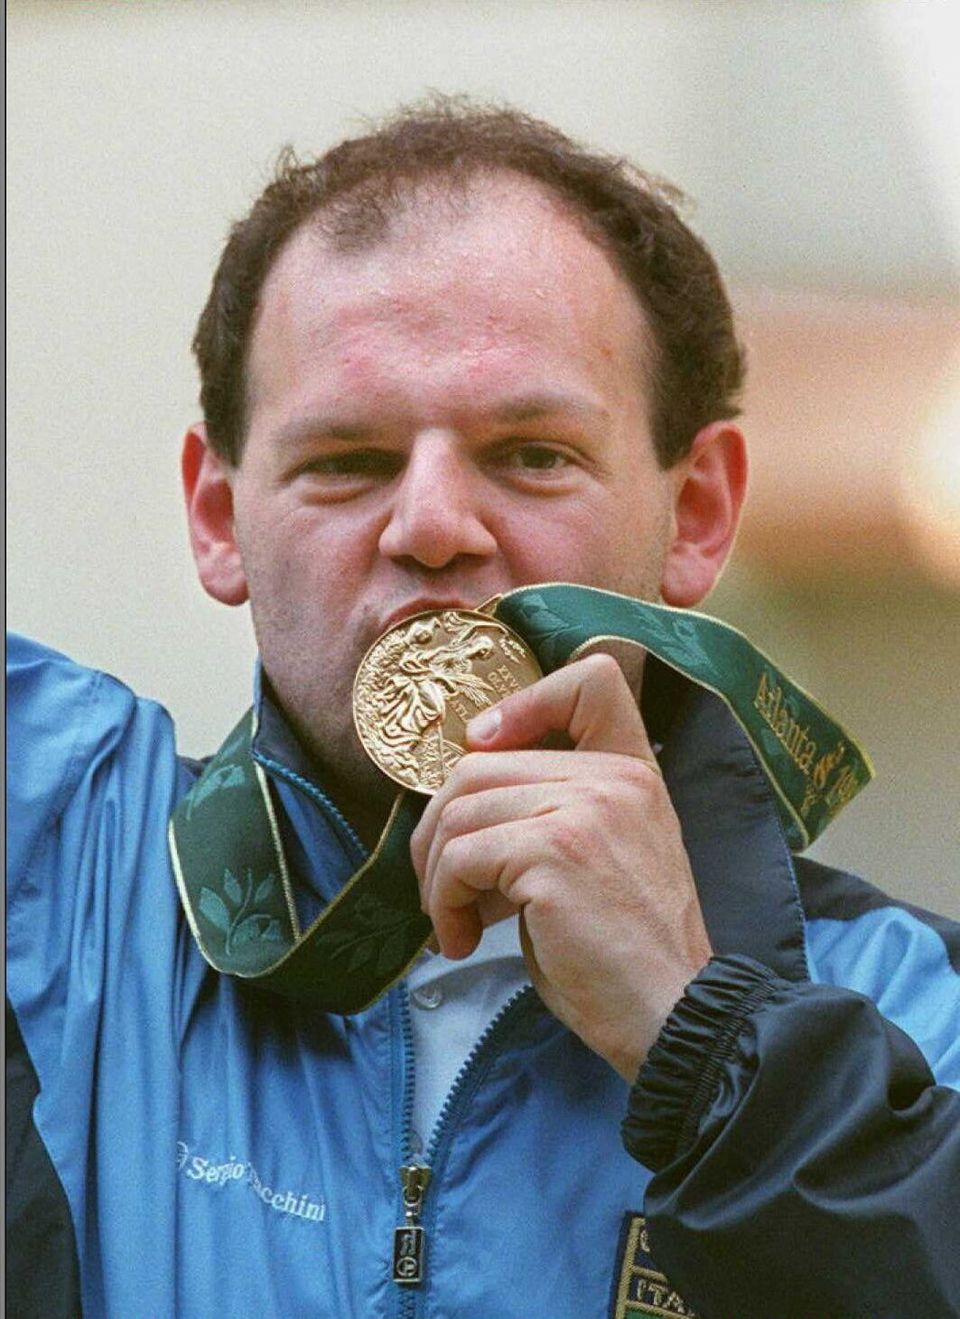 ATLANTA, GA - JULY 20: Italy's Roberto Di Donna bites his gold medal after winning the men's air pistol...